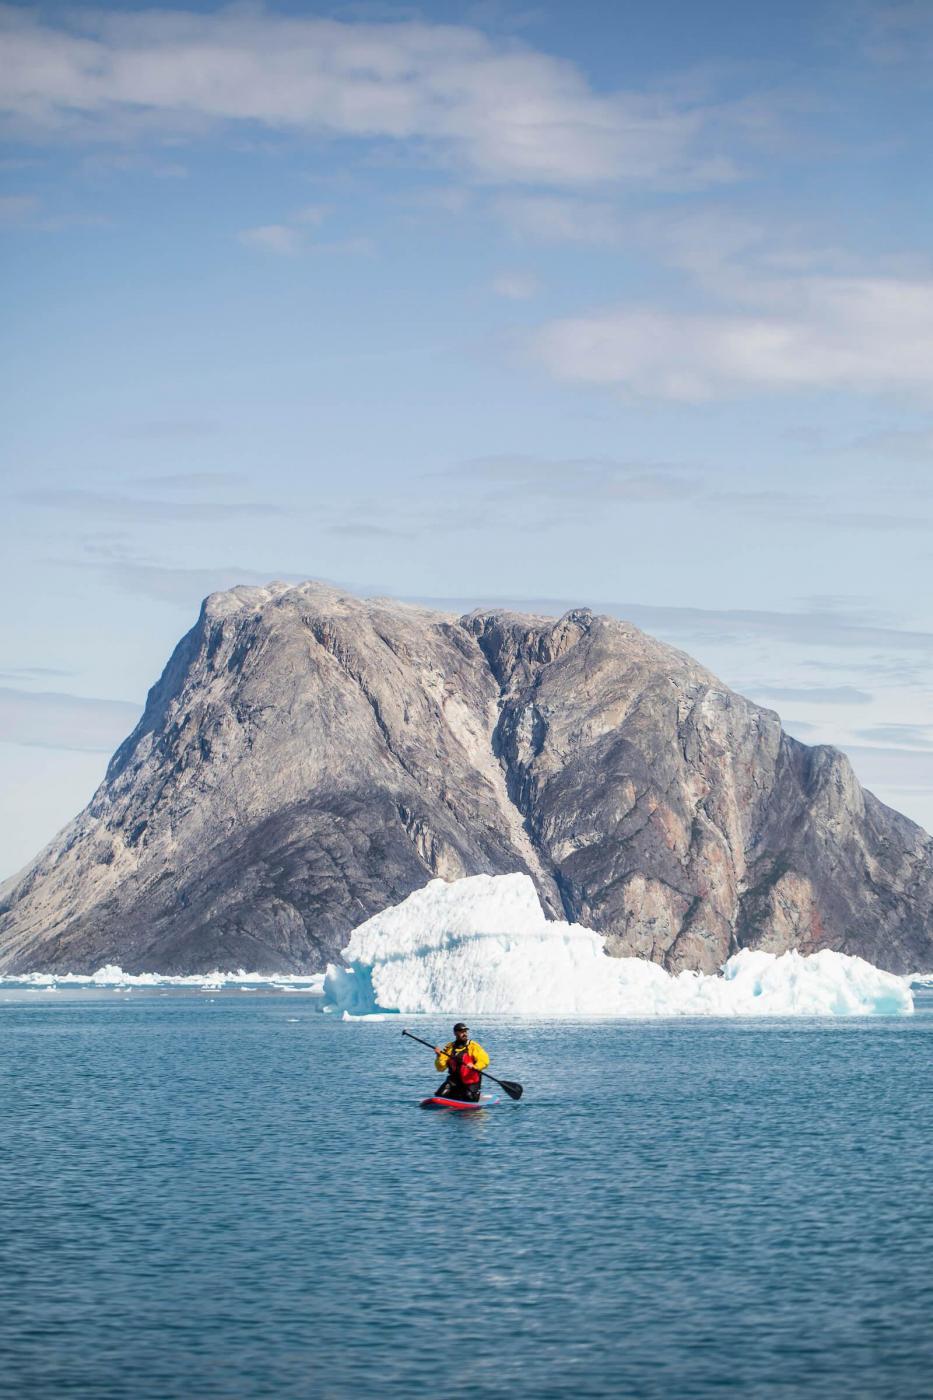 Paddle Boarding Between Icebergs. Photo - Aningaaq R. Carlsen, Visit Greenland